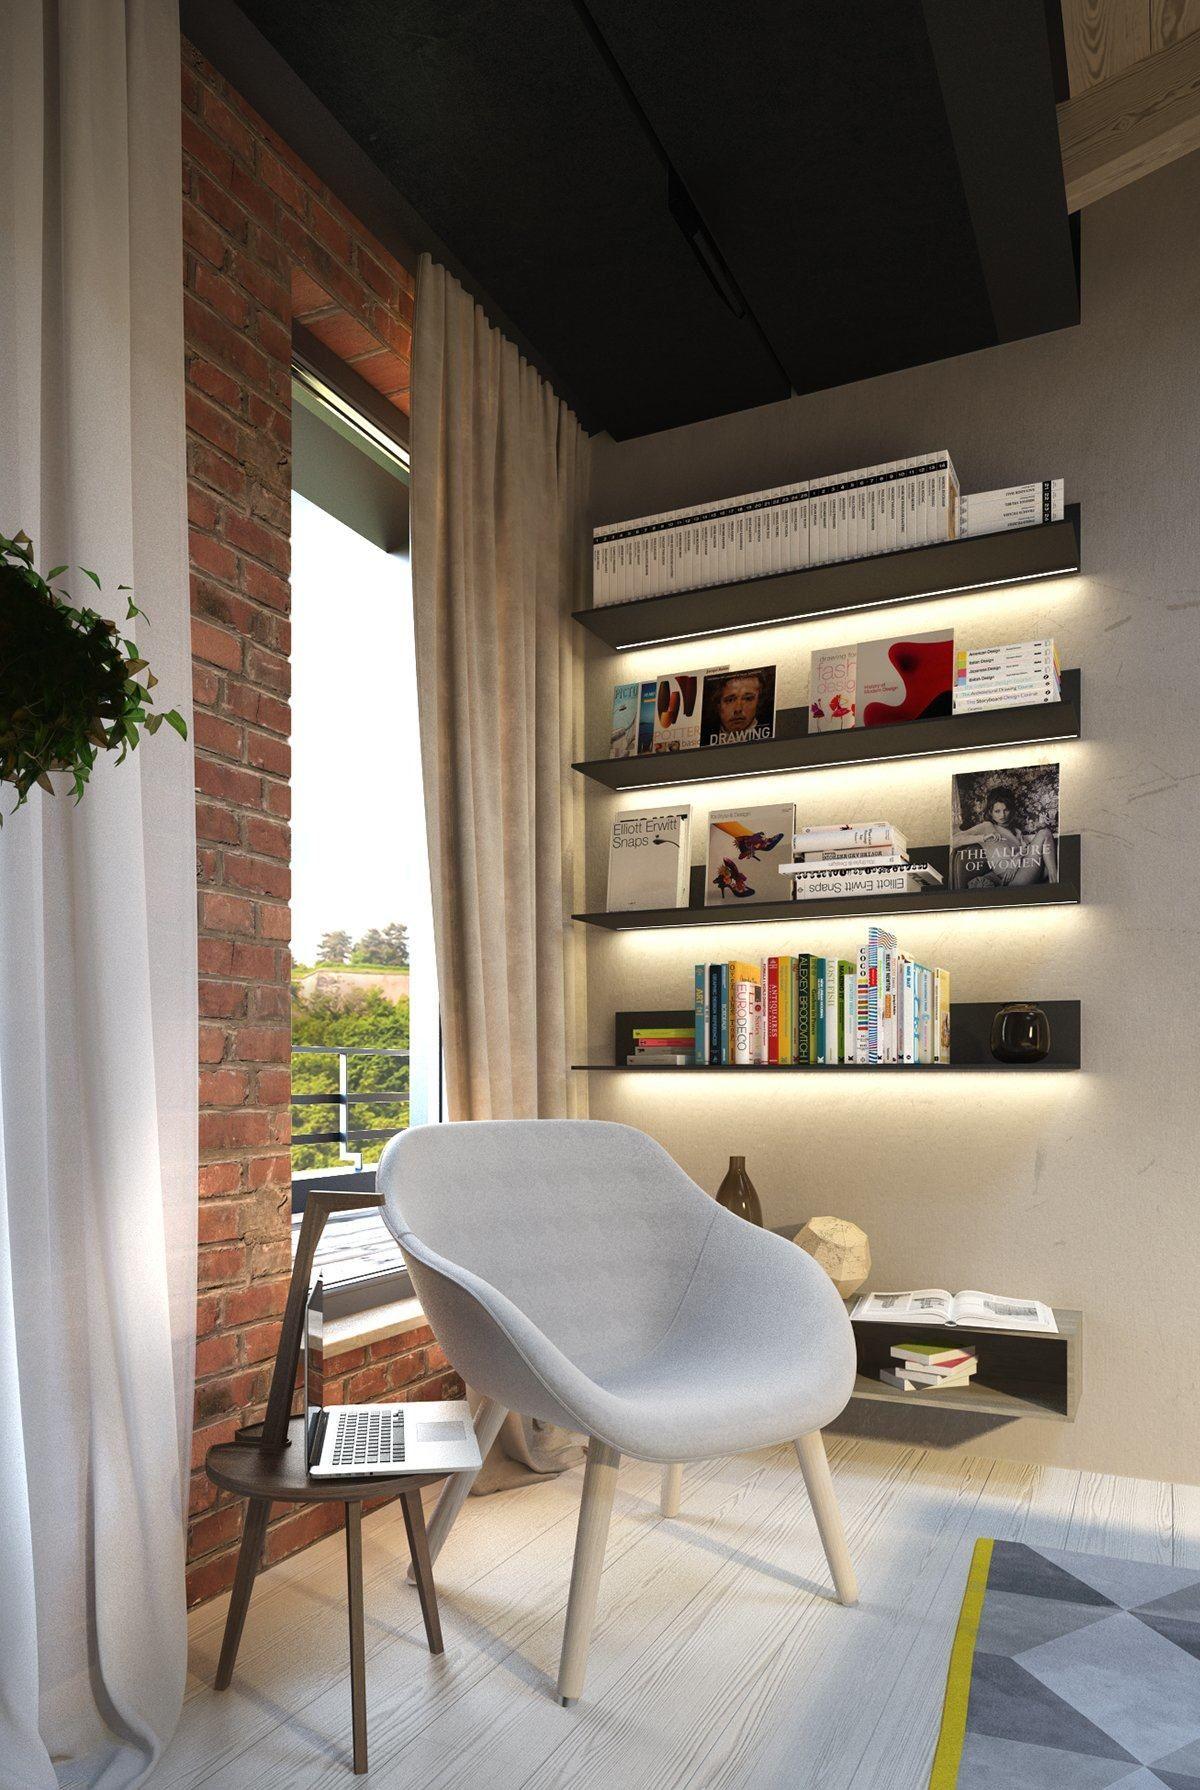 Exposed Concrete Walls Ideas Inspiration House Design Concrete Wall Dark Interior Design